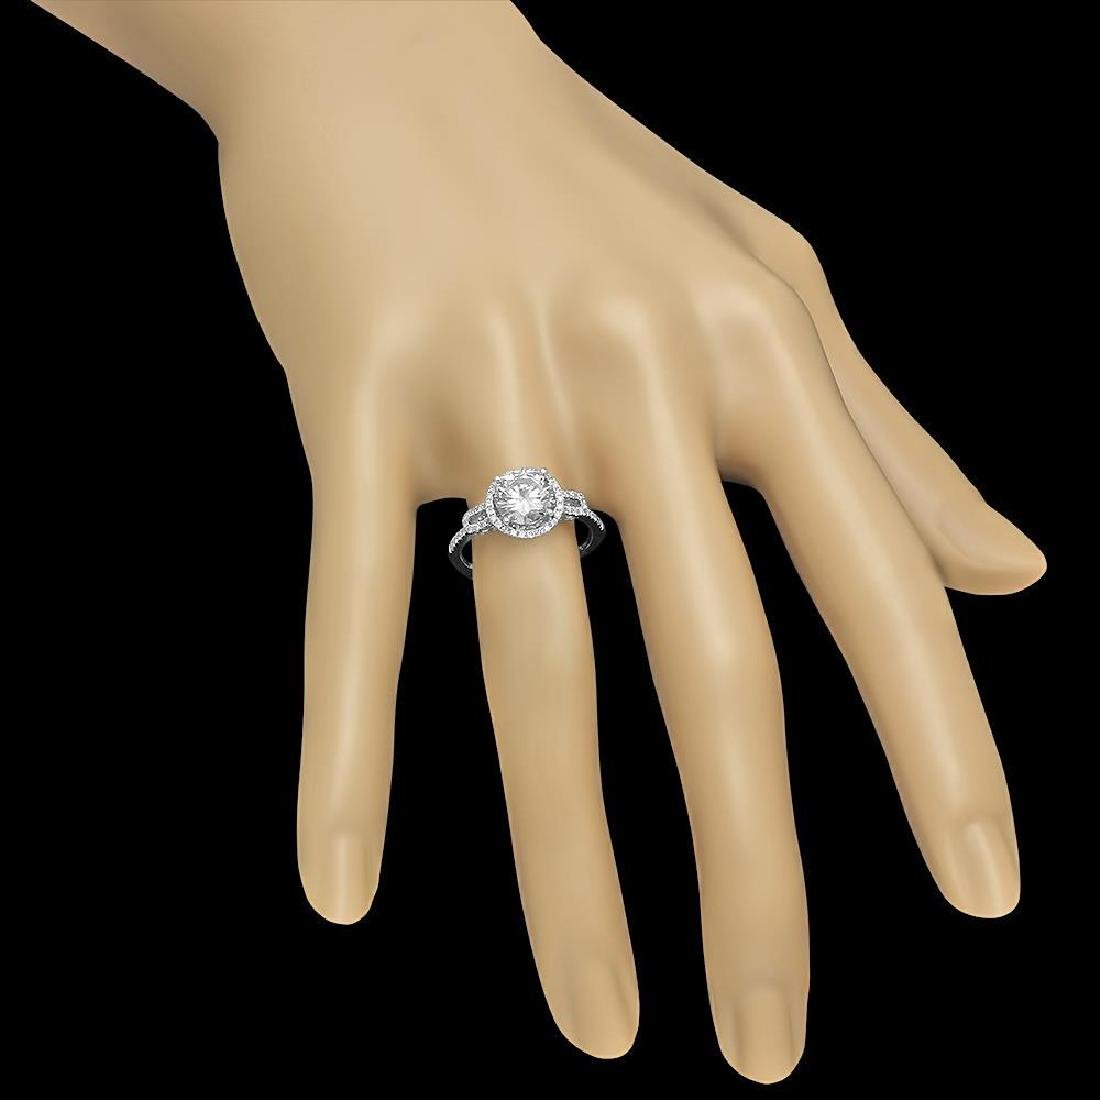 14K Gold 1.79ct Diamond Ring - 3